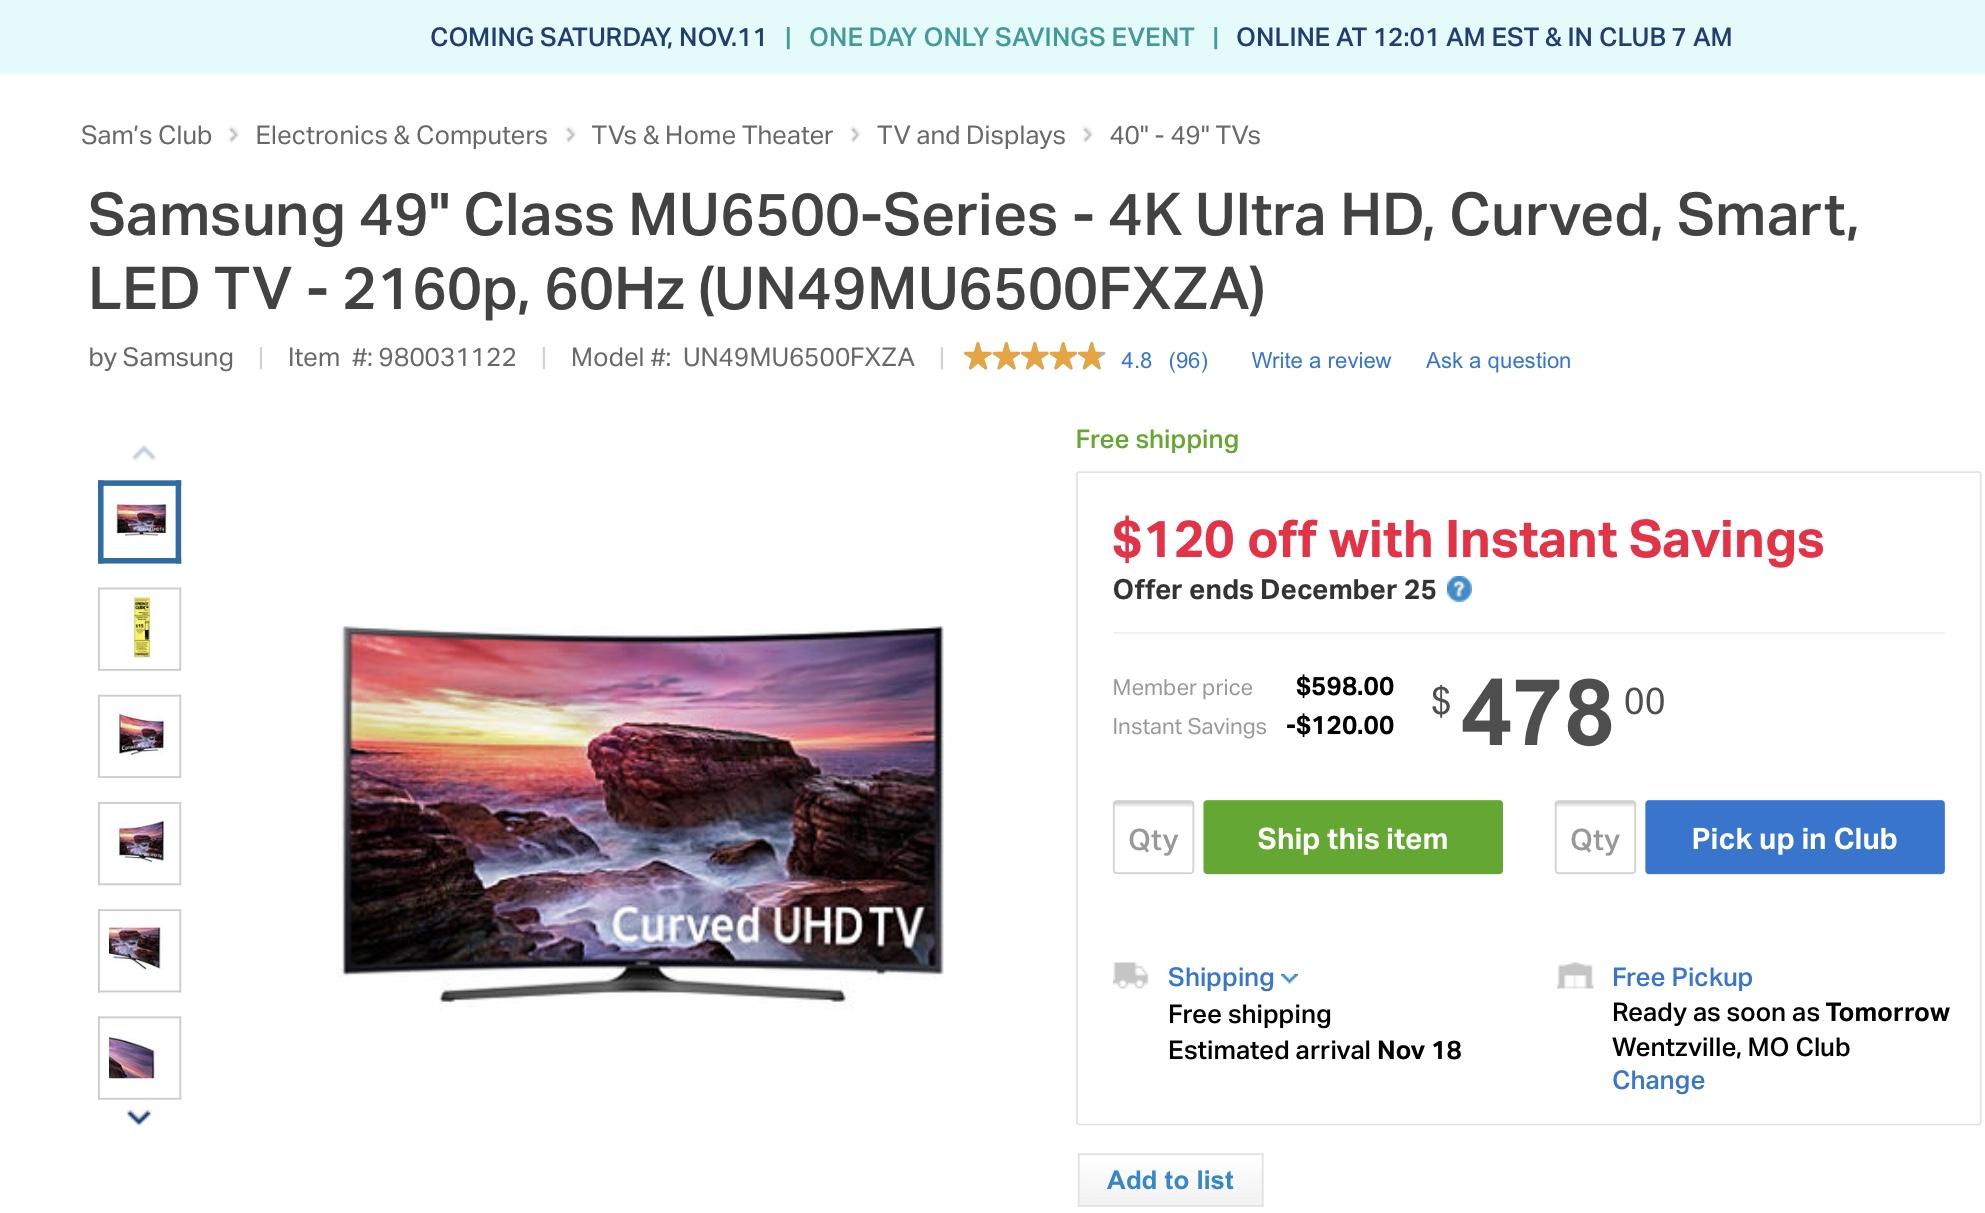 "Samsung 49"" Curved LED MU6500 Series $478"